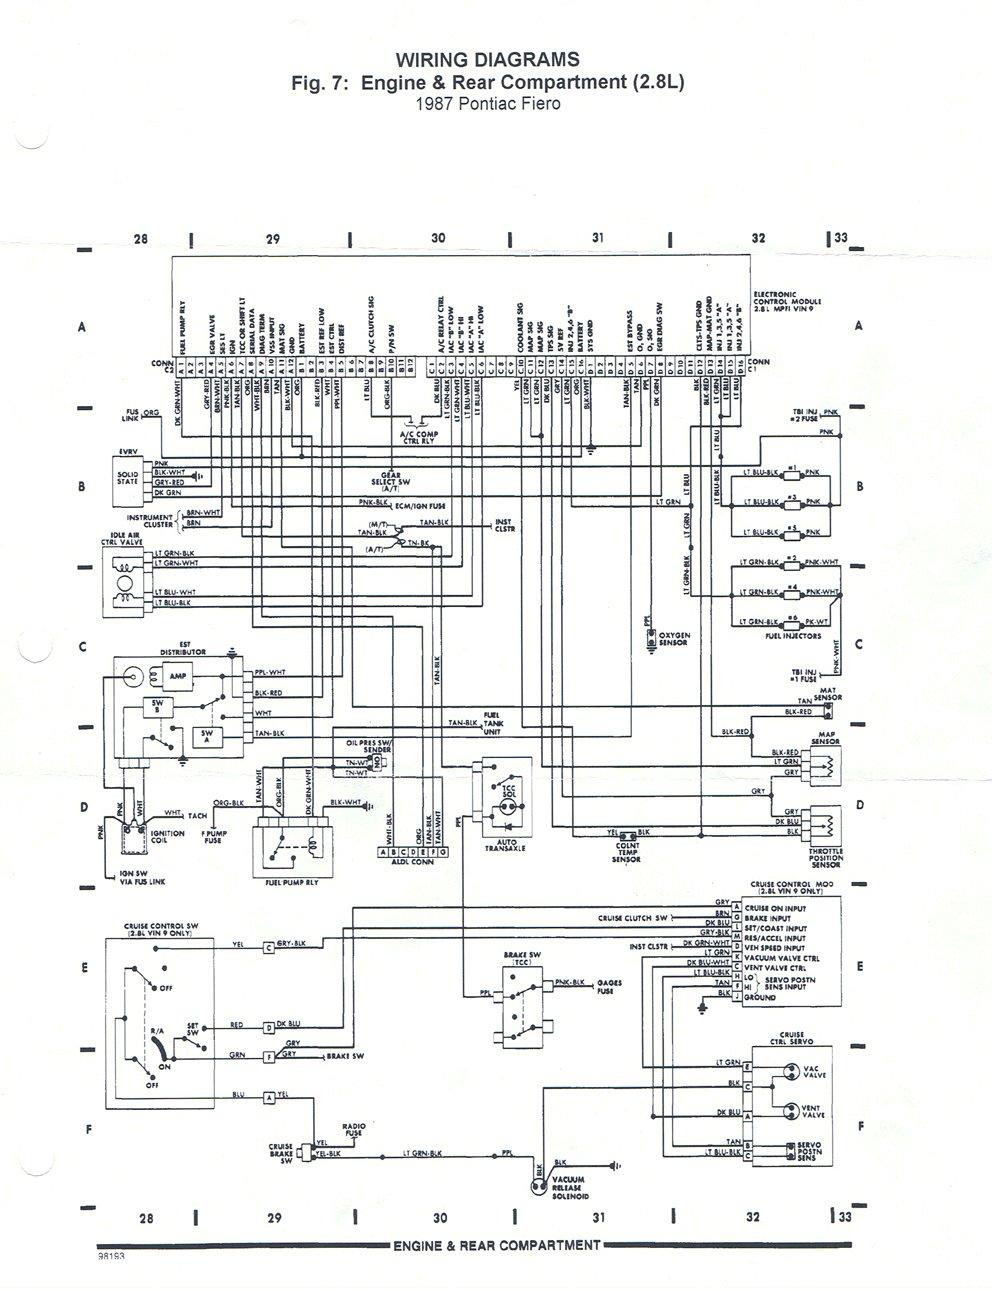 penn temperature control wiring diagram 39 wiring 1992 jeep wrangler temp wiring schematic trol a temp wiring